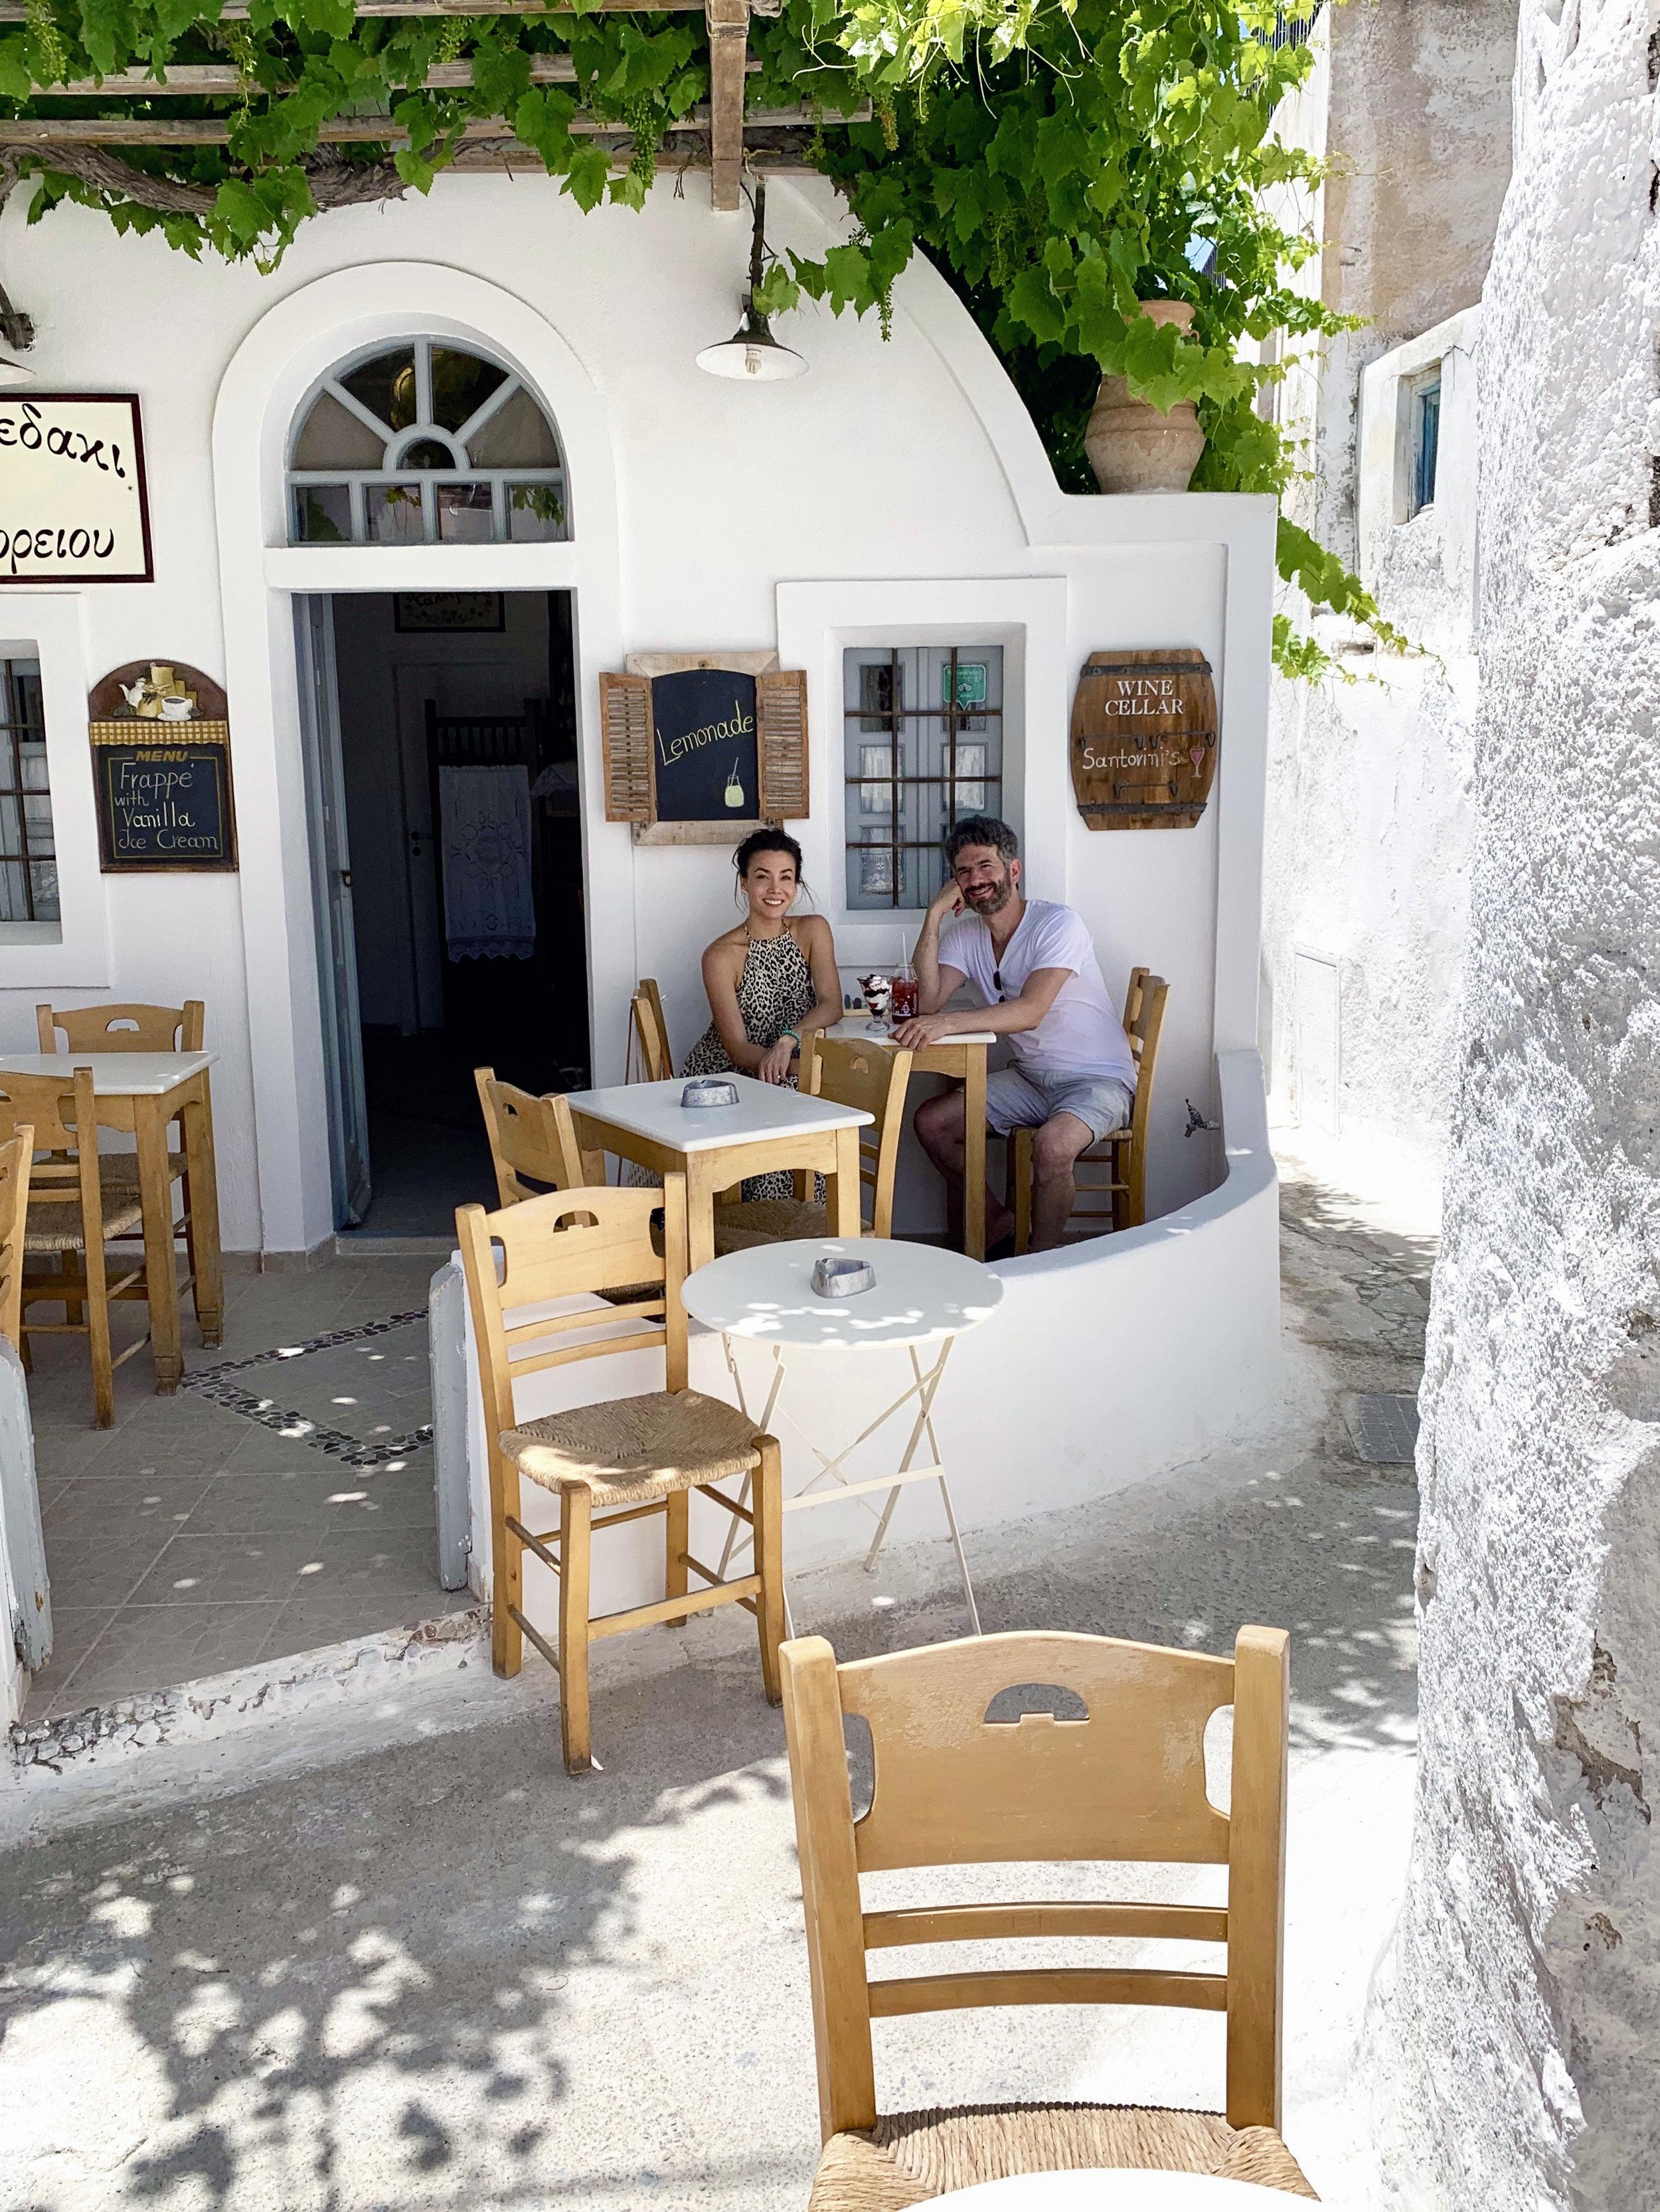 Greek yogurt at To Kafenedaki tou Emboriou